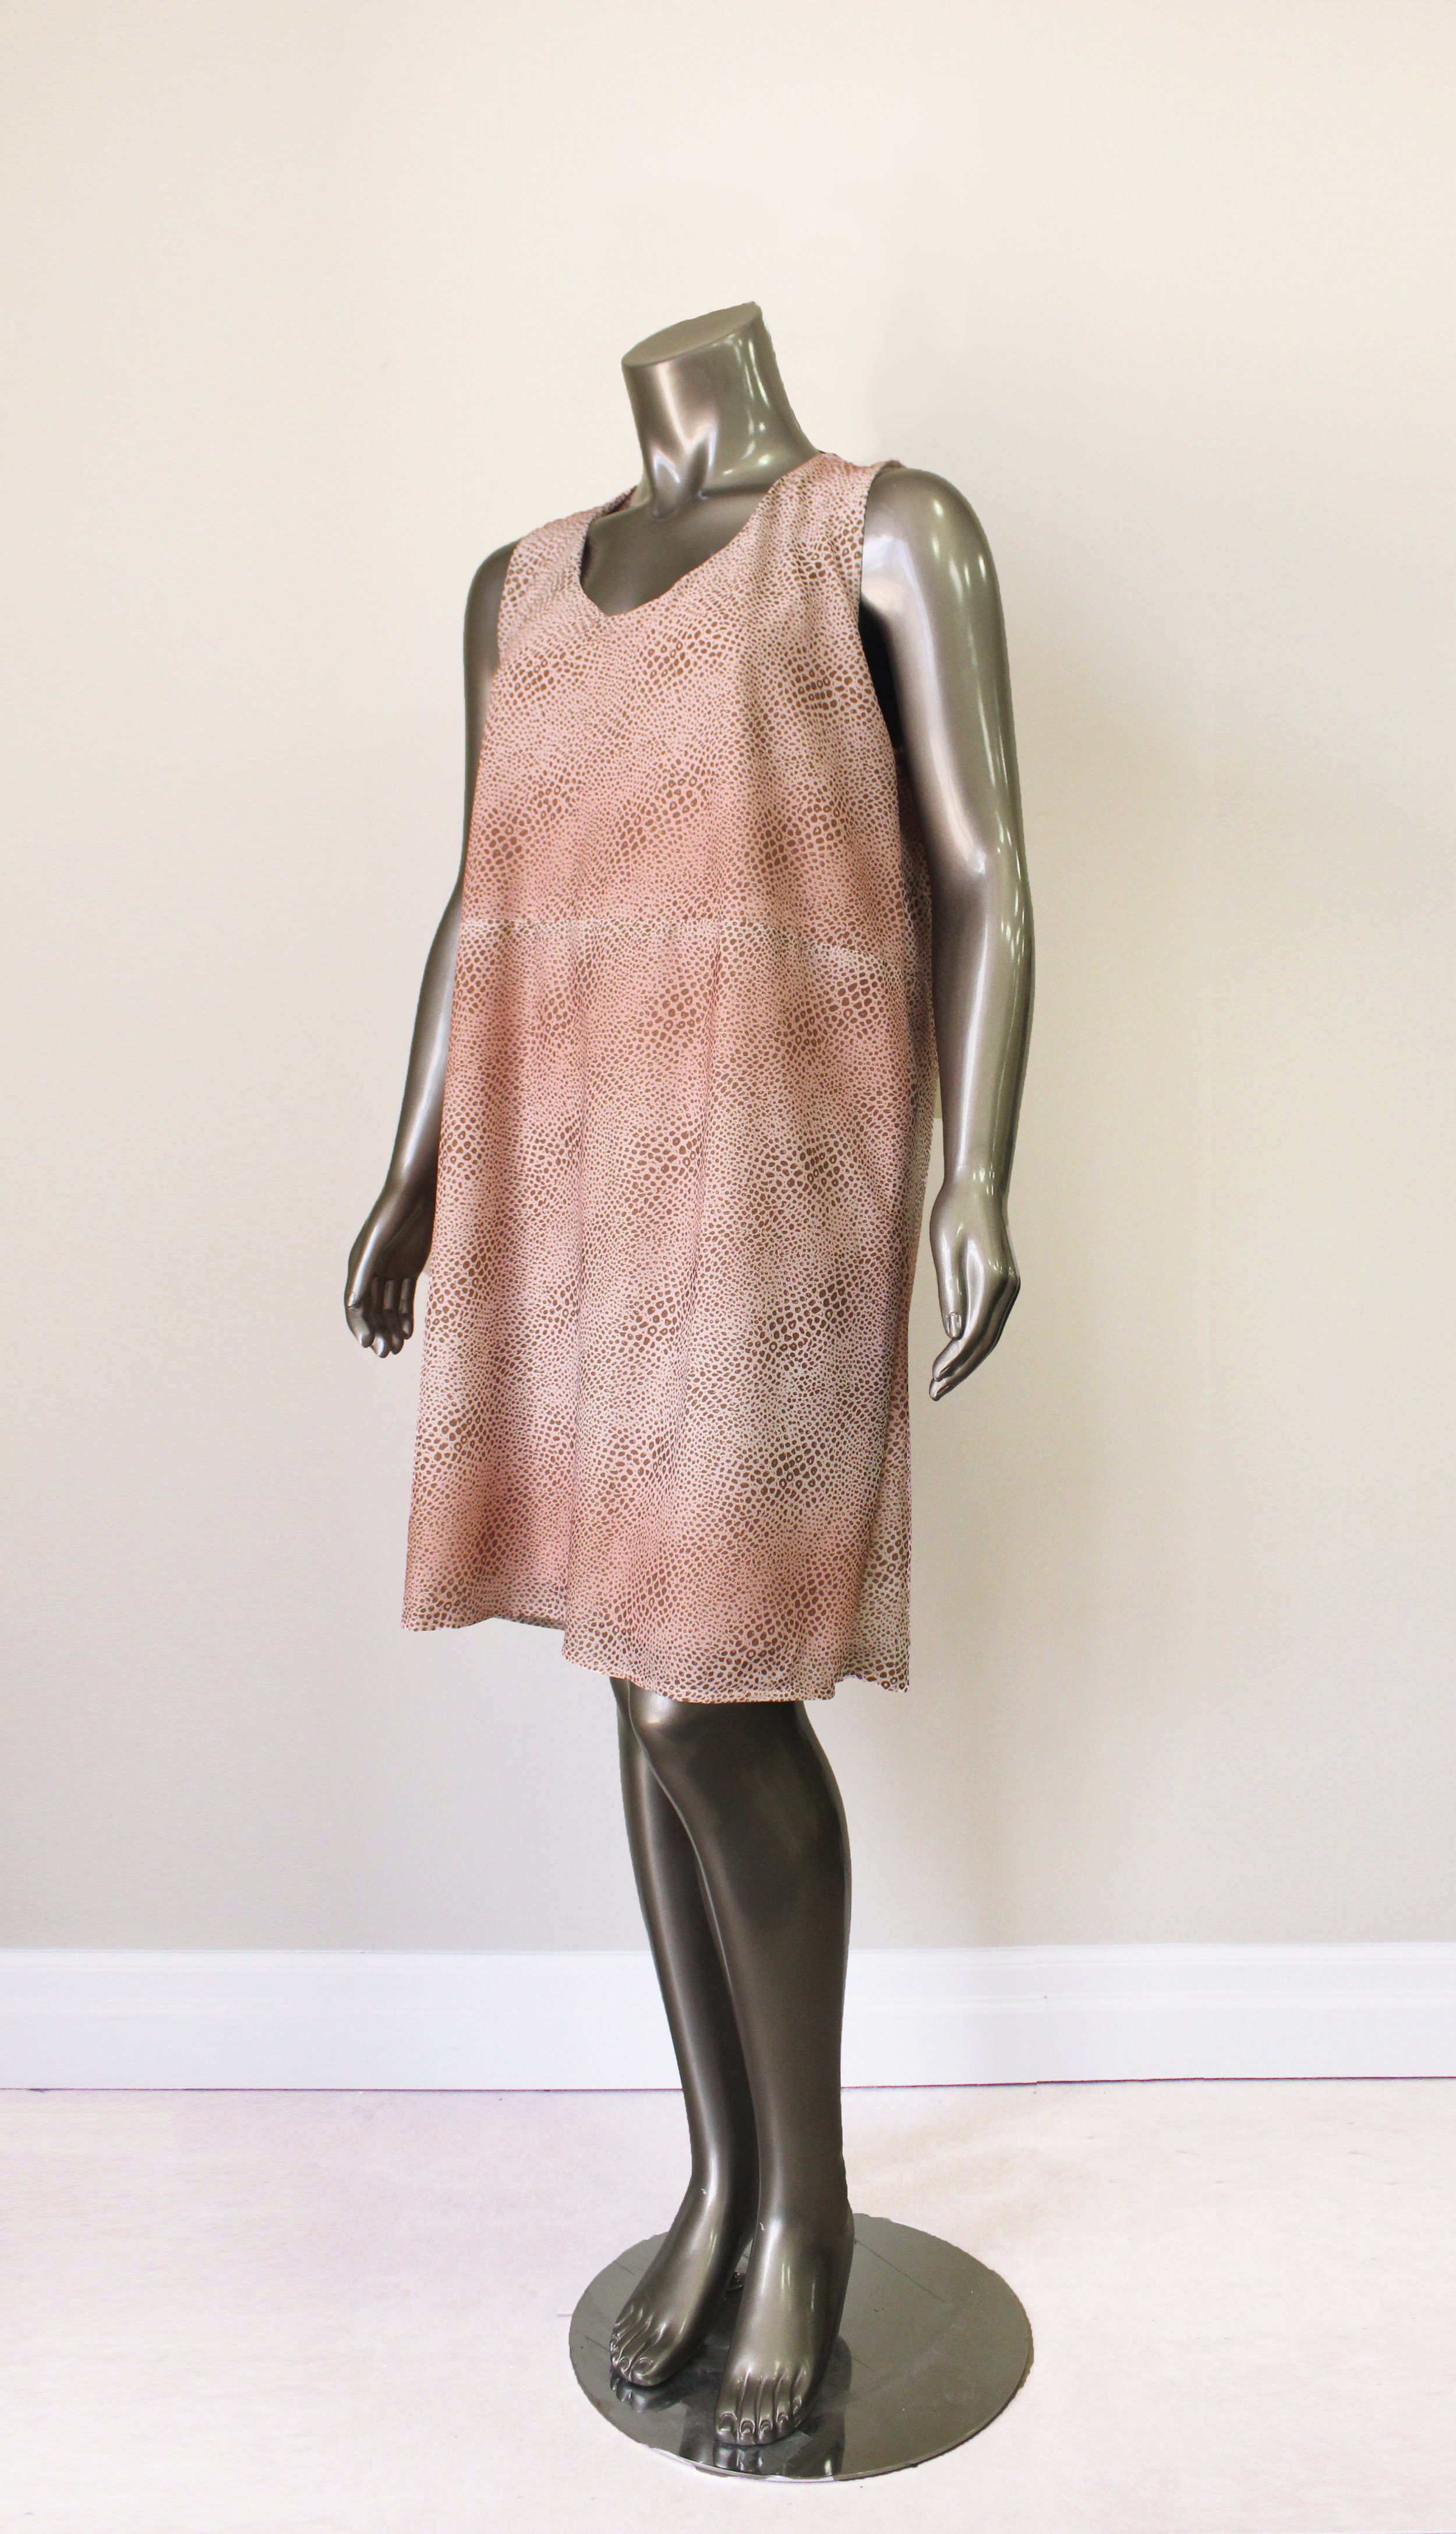 Pink Animal Print Dress - $88CAD